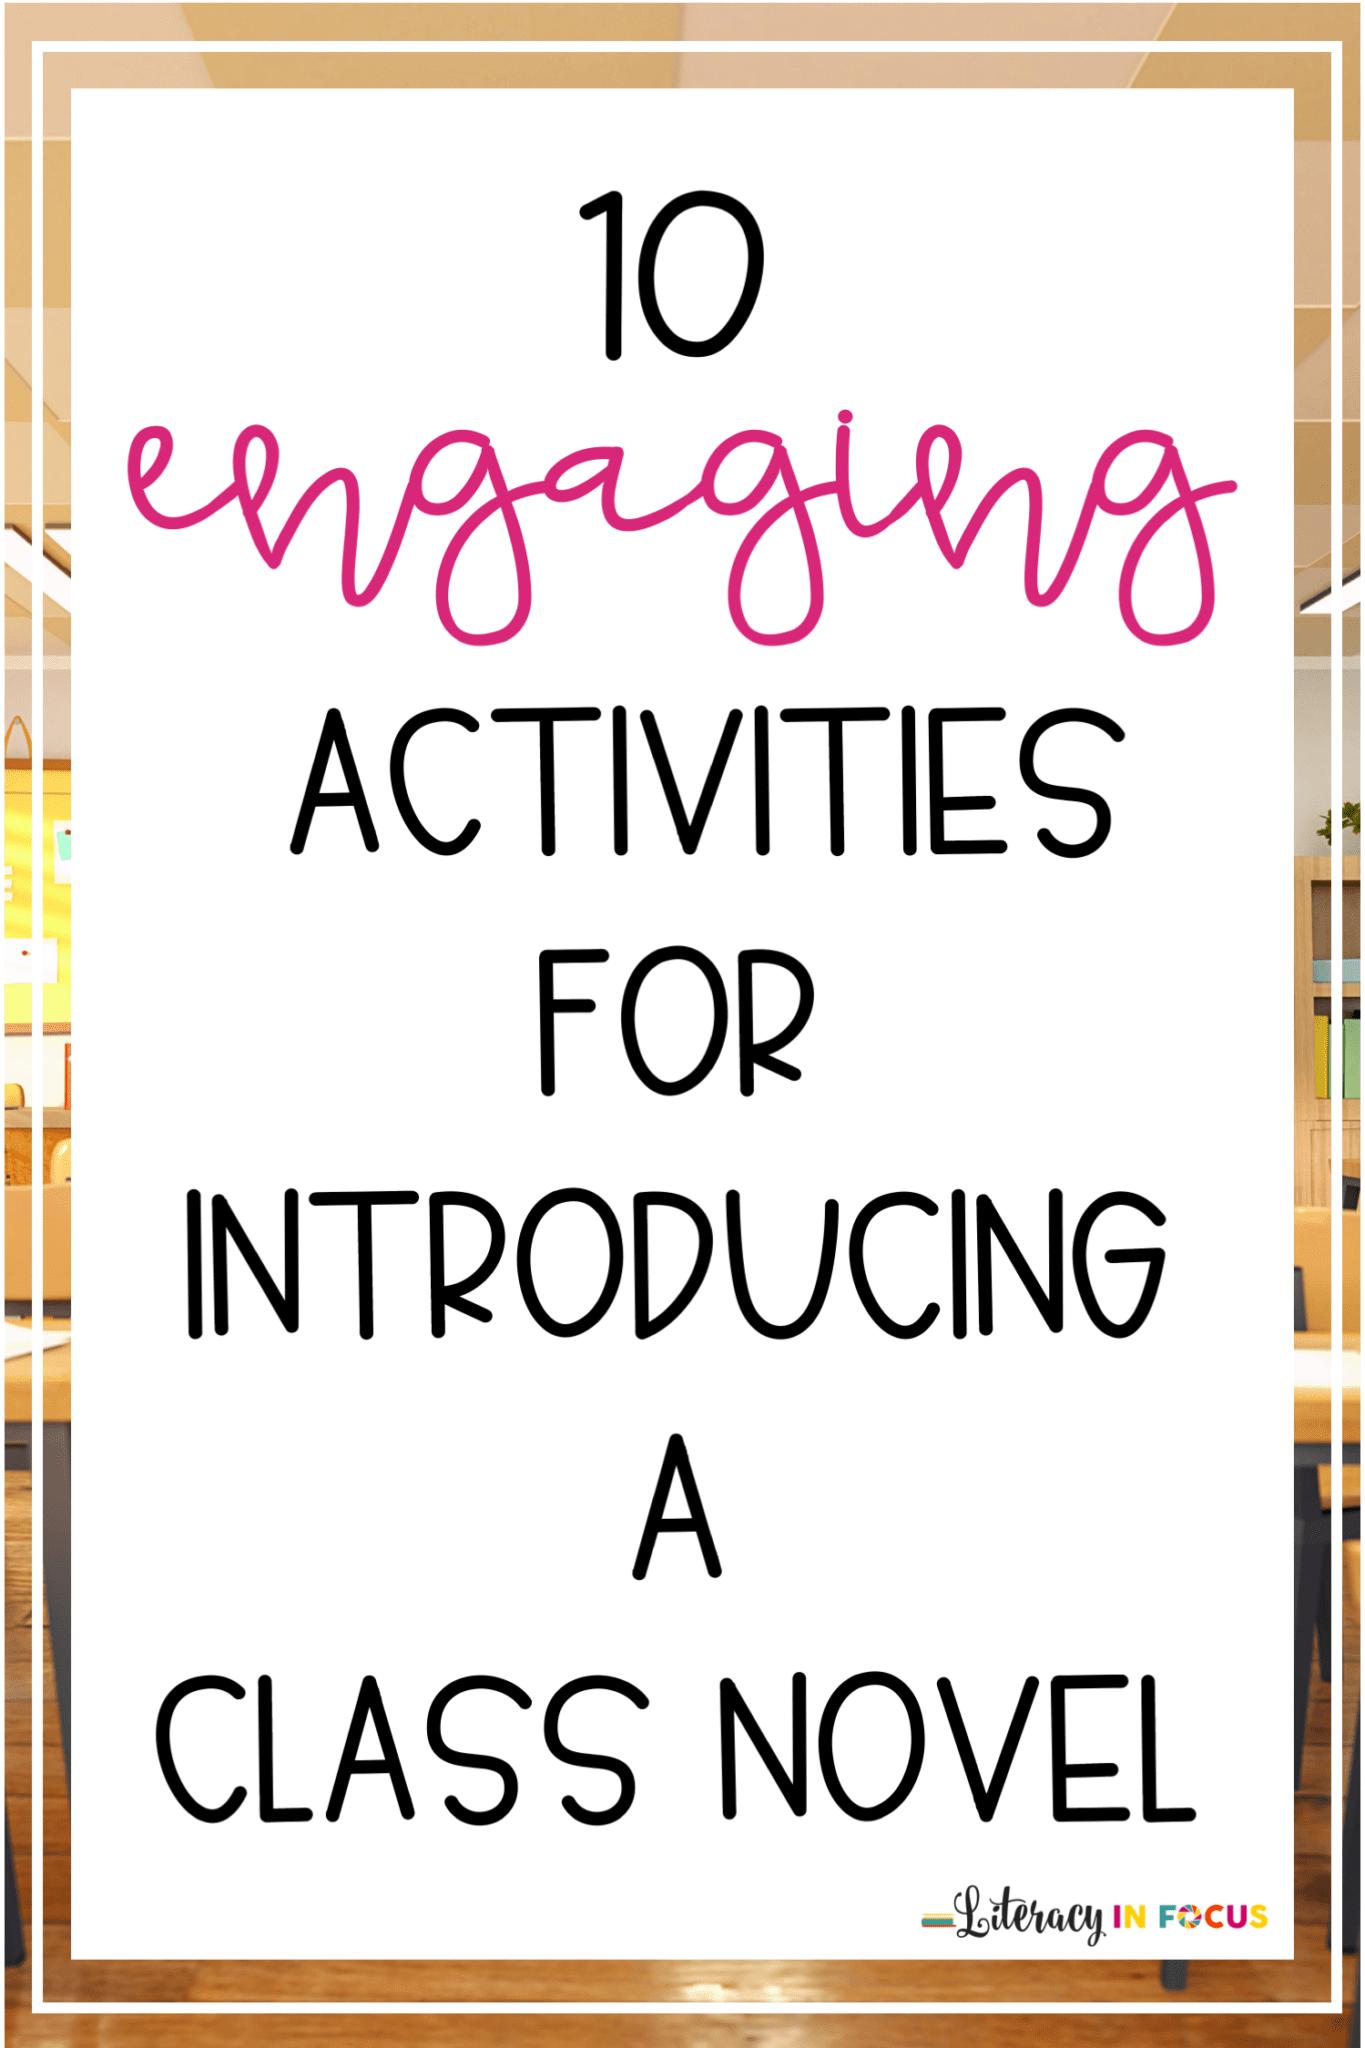 Ideas for Introducing a Class Novel